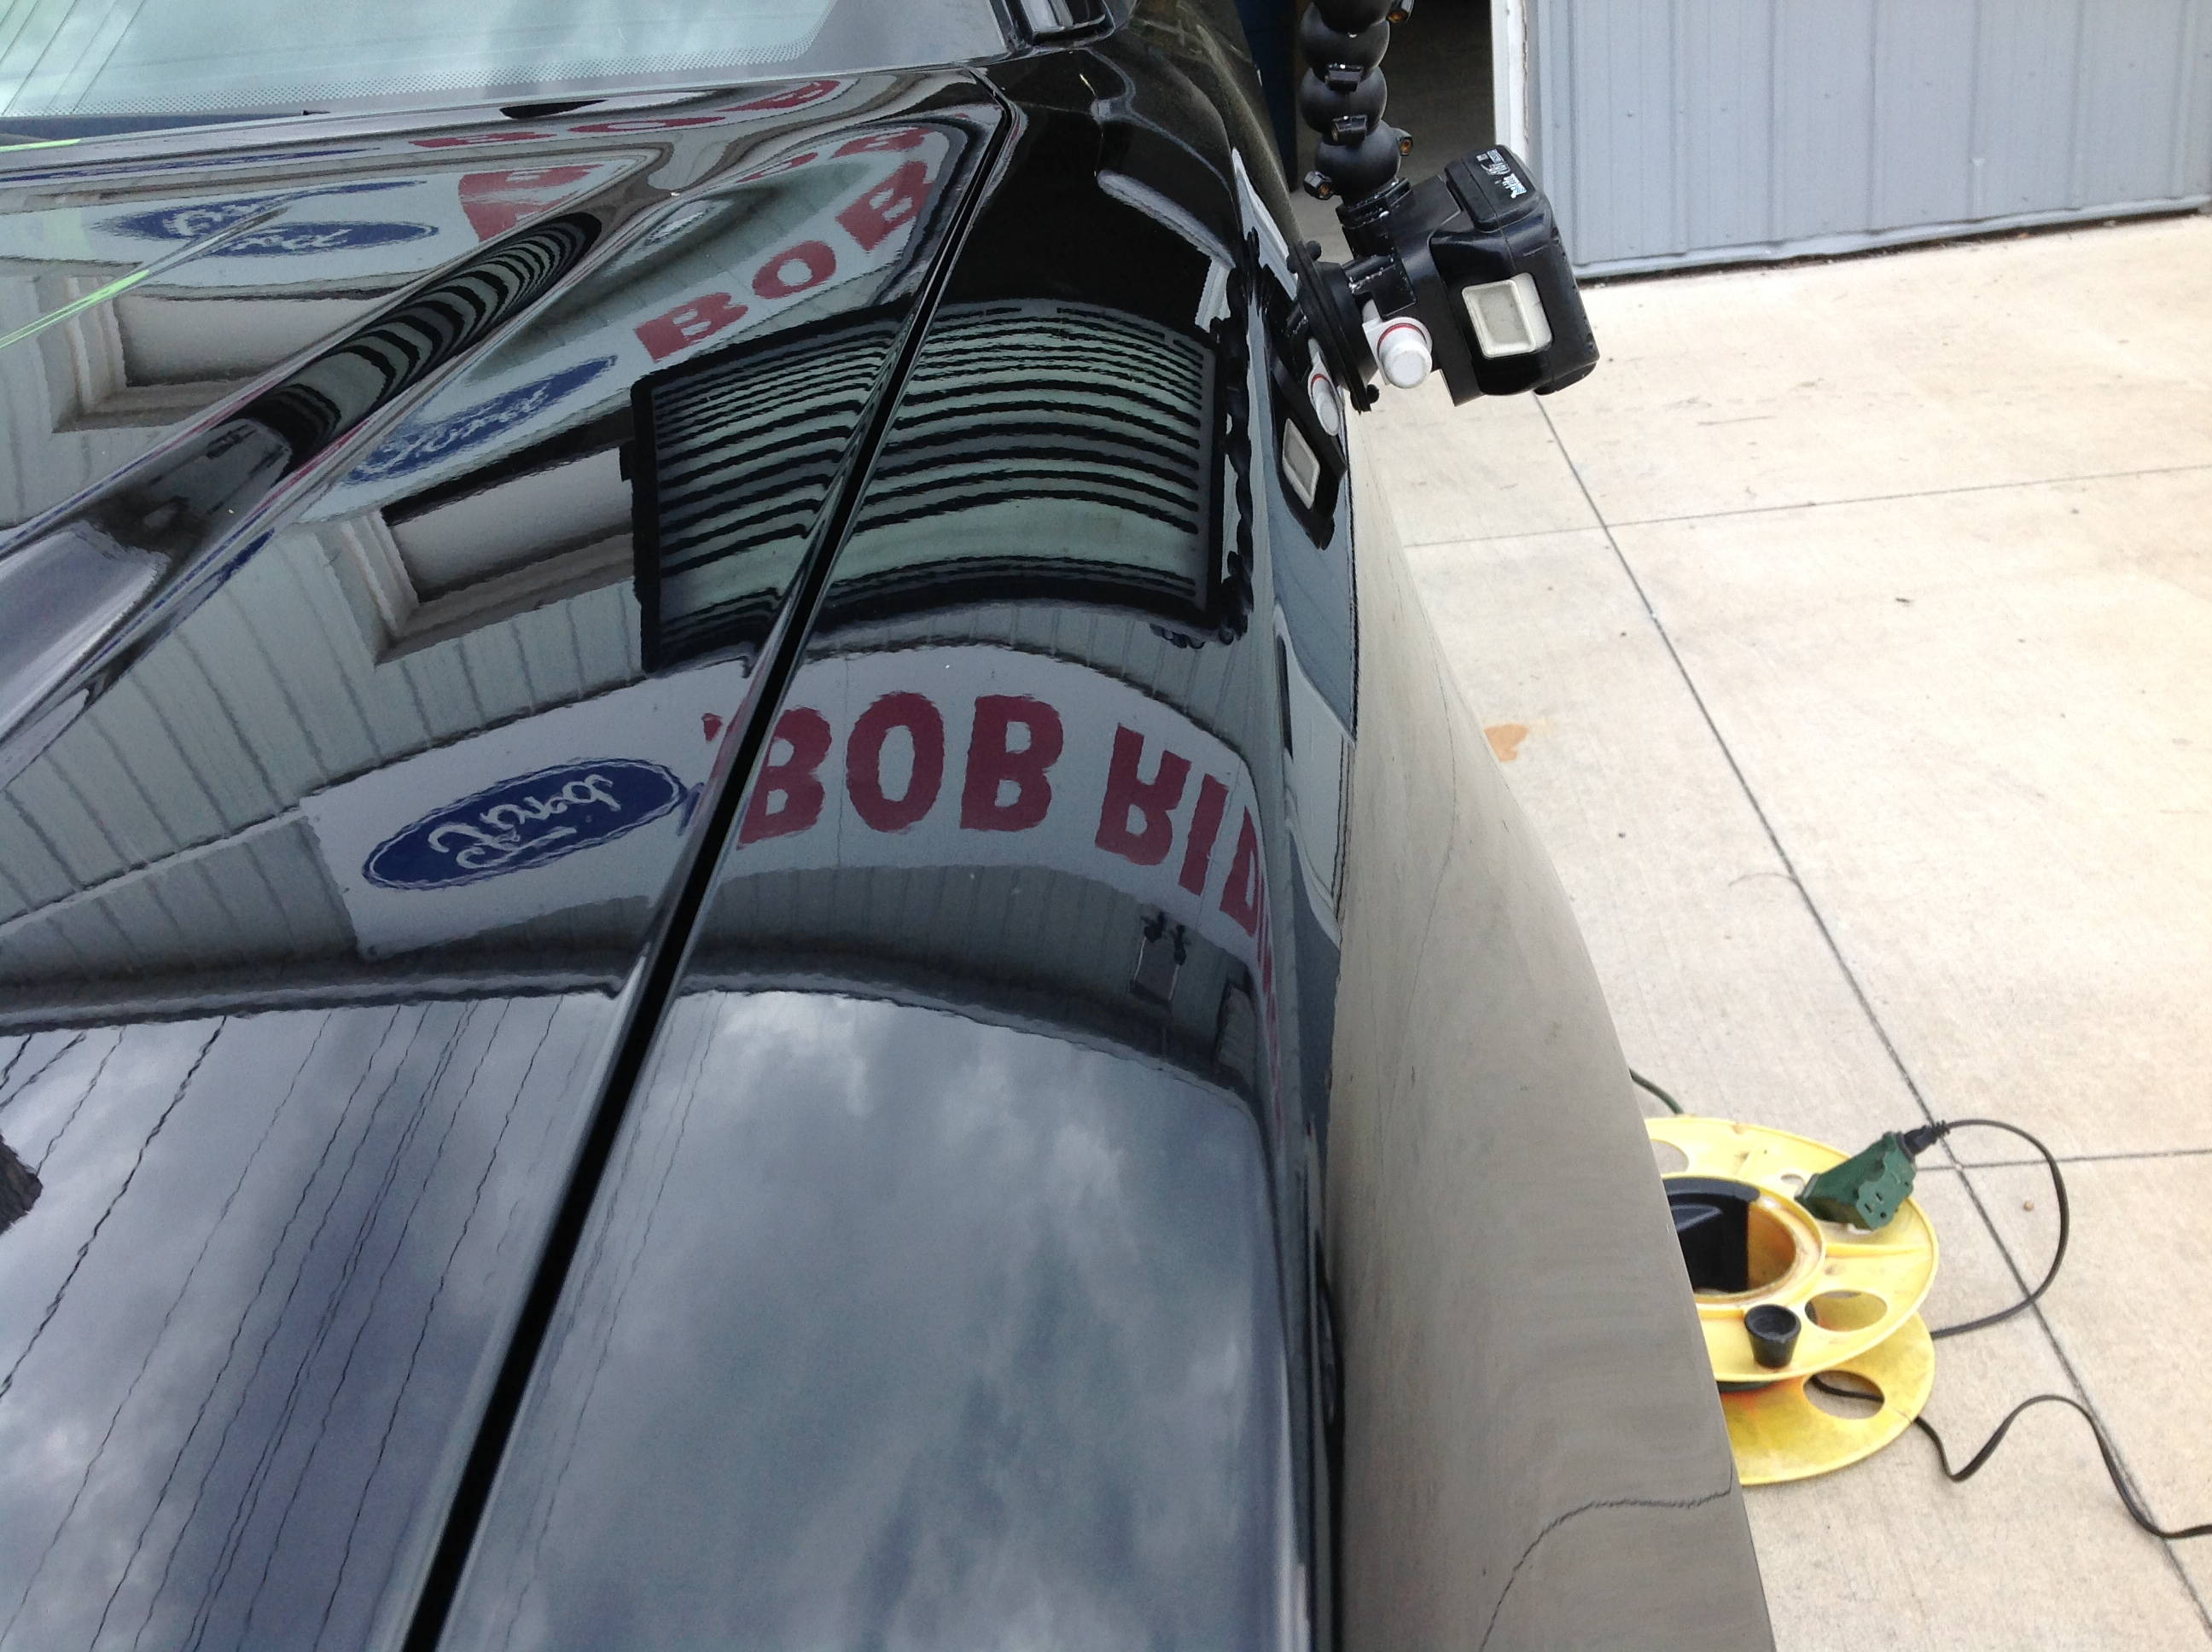 2011 Dodge Charger Driver's Fender Dent Removal, Springfield IL, Taylorville IL, Decatur IL, Mobile Dent Repair http://217dent.com